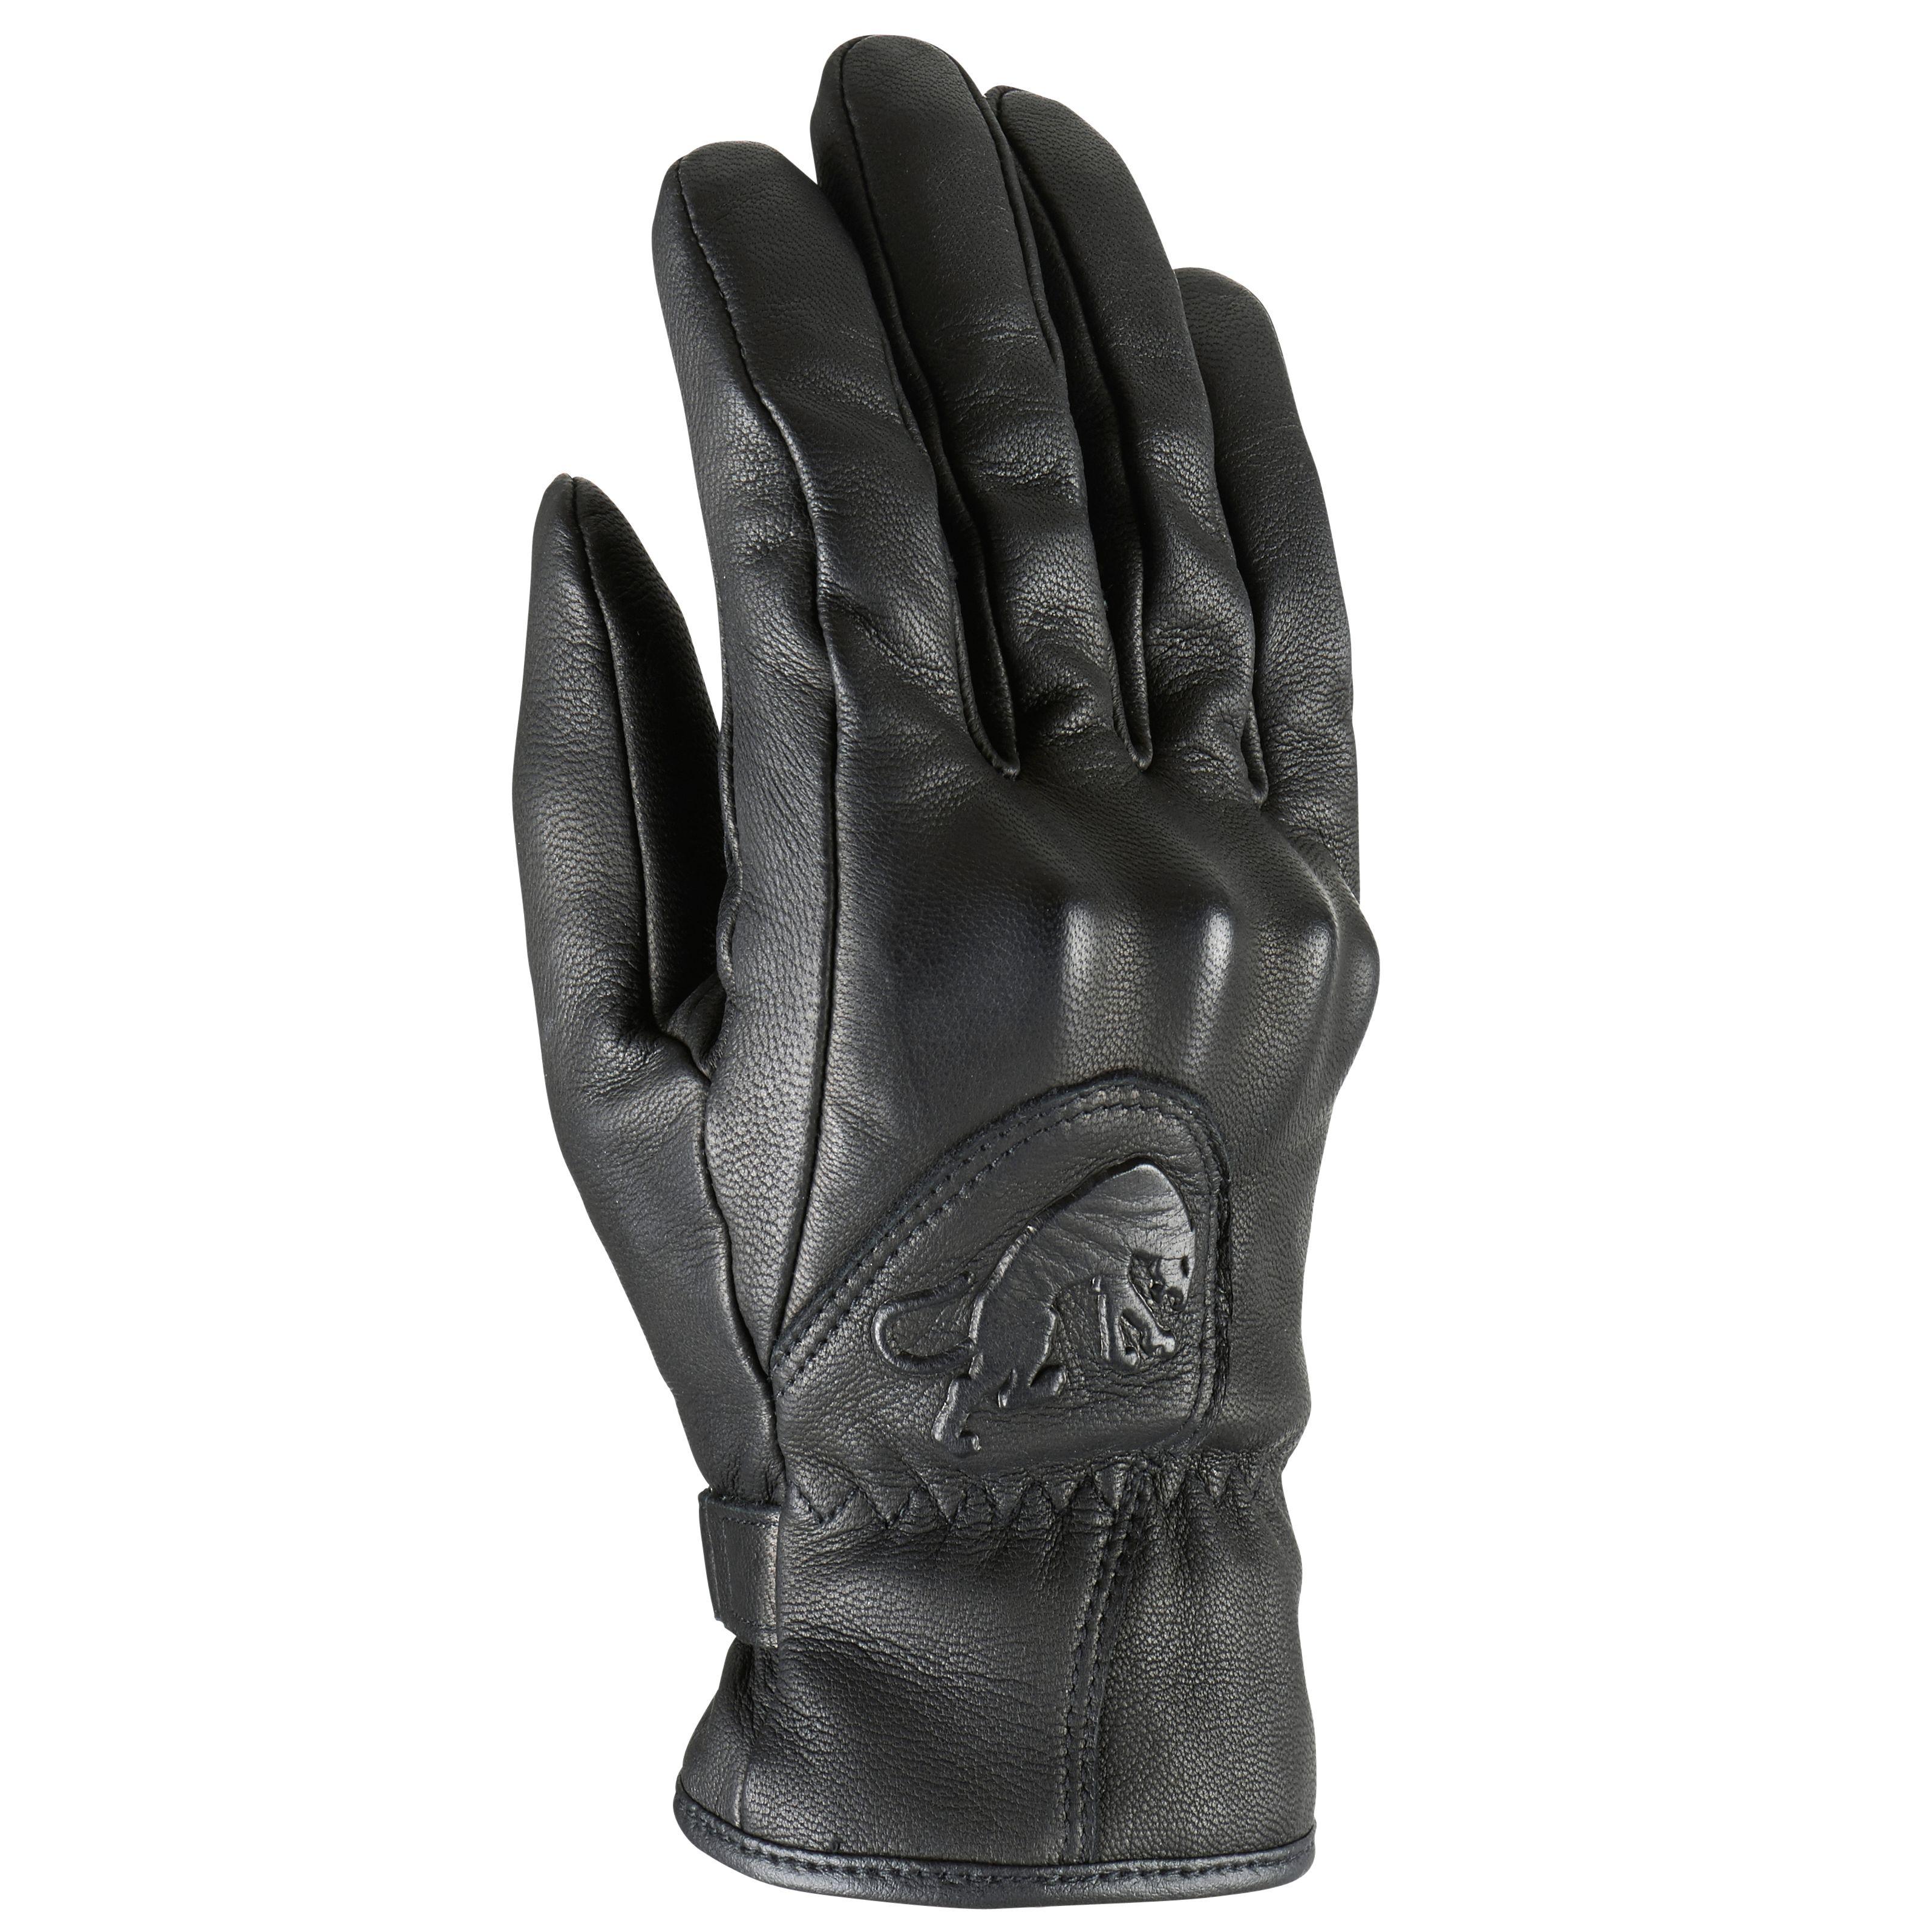 gants furygan gr all seasons gants moto. Black Bedroom Furniture Sets. Home Design Ideas